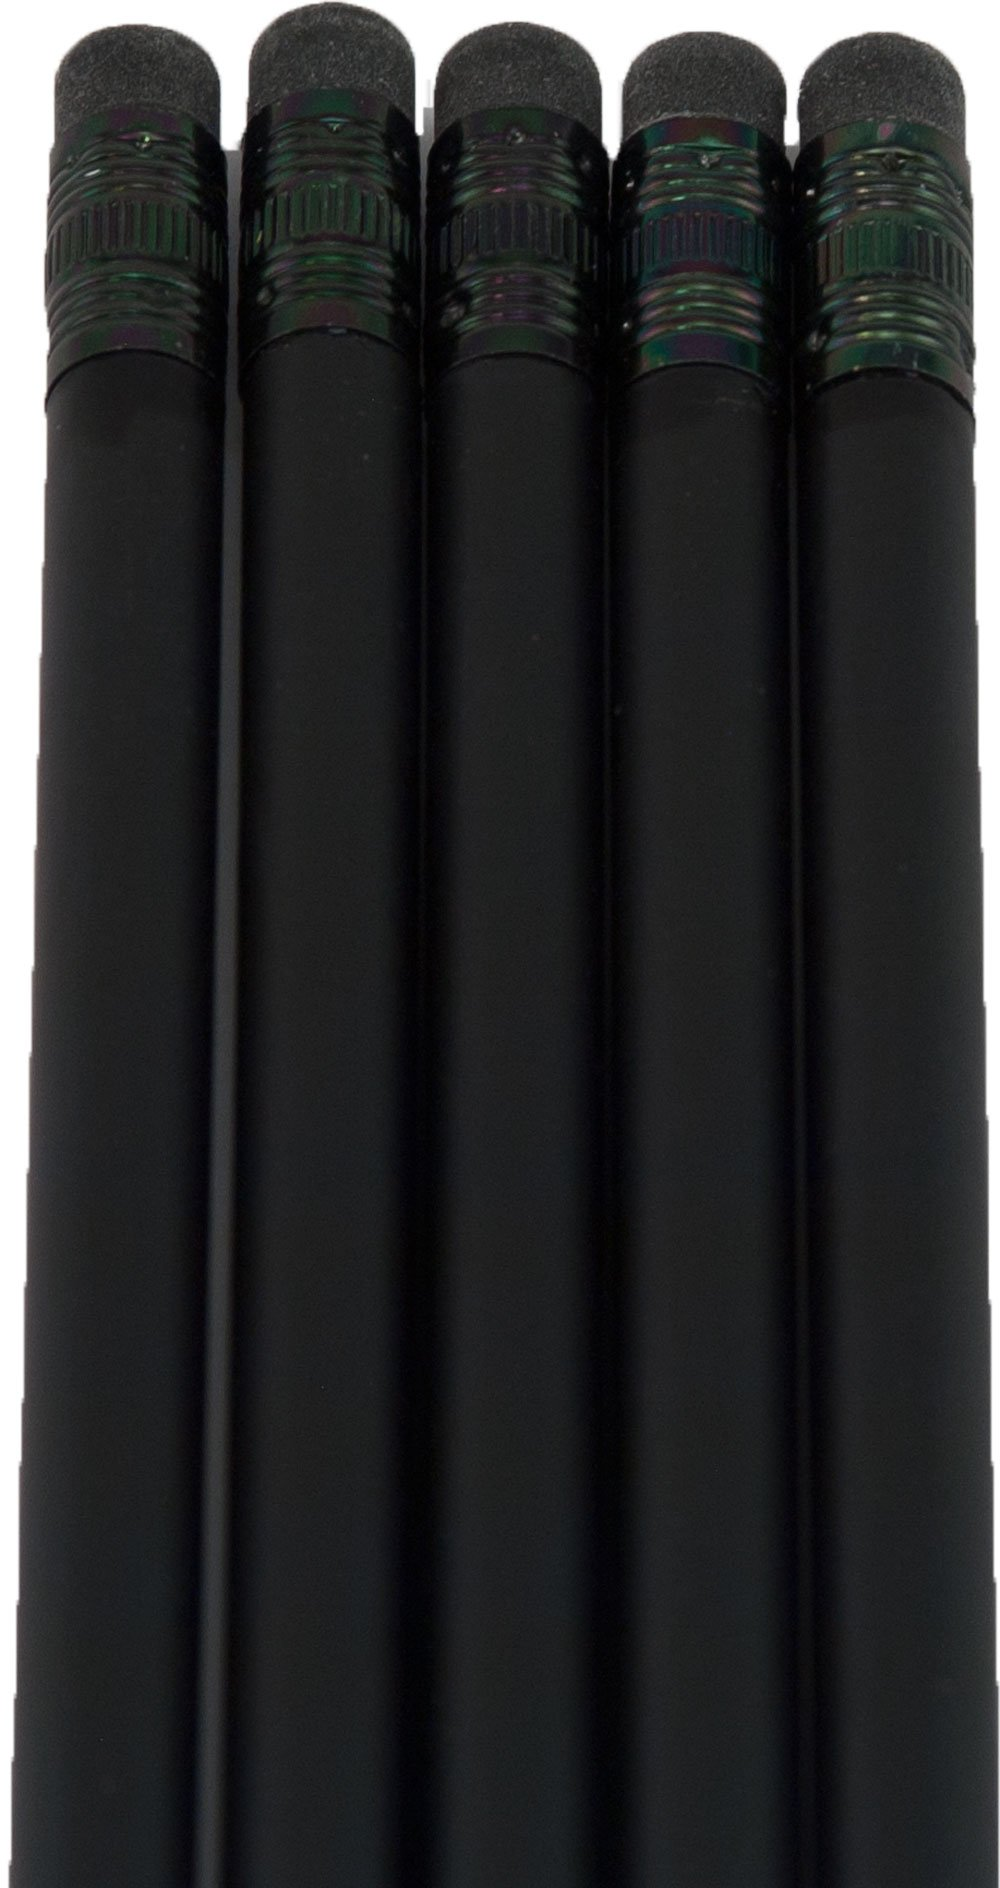 Ultra Premium Matte Black Pencil (Black Wood Matte Black with Black Eraser)(#2HB Lead) (Matte Black)(Bag of 36) by Graphite Pen & Pencil Company (Image #3)